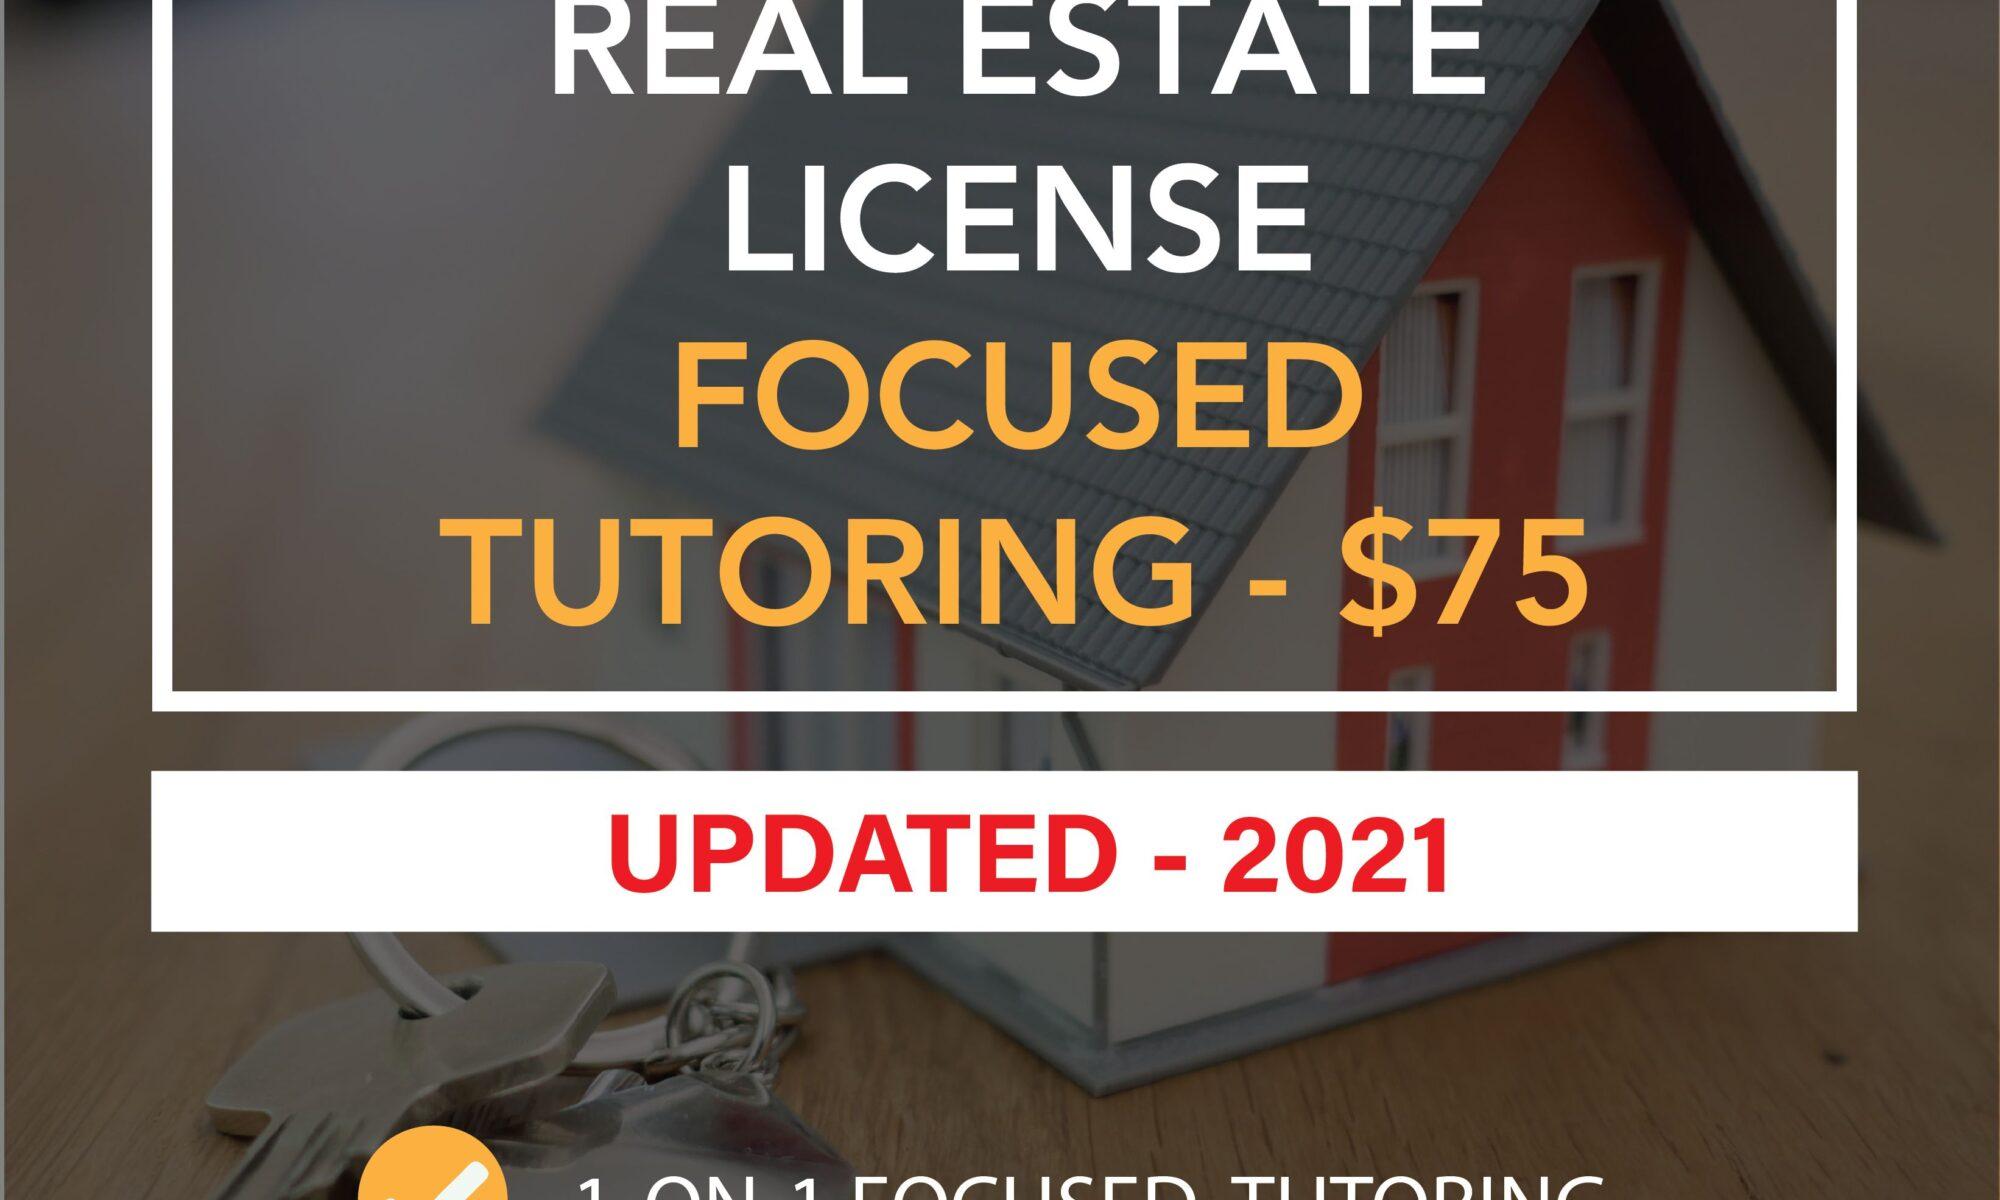 Real Estate License Focused Tutoring